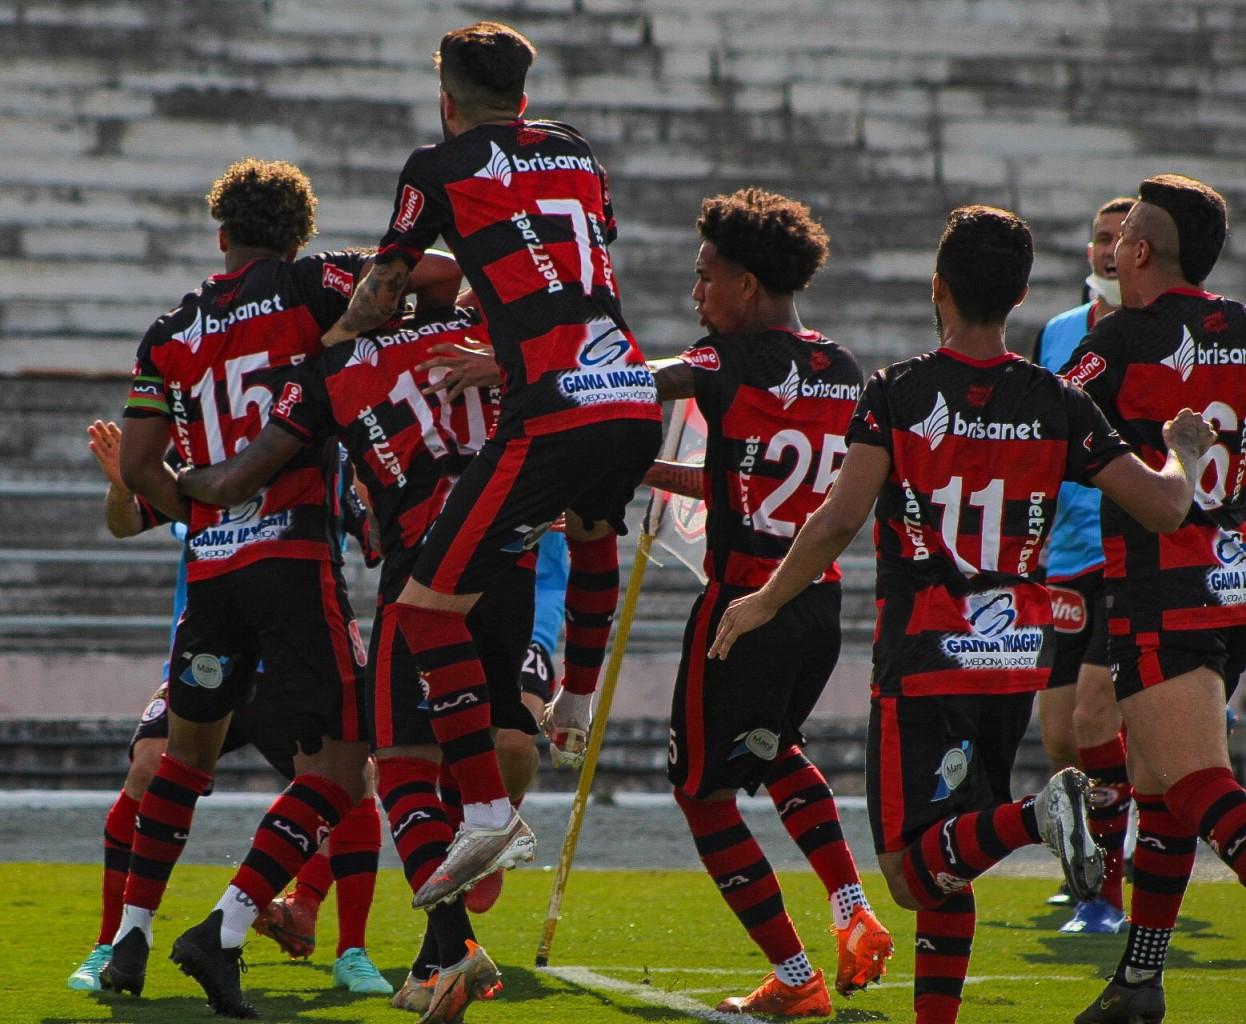 campinense - Nos pênaltis, Campinense vence Sergipe e se classifica para oitavas de final da Série D